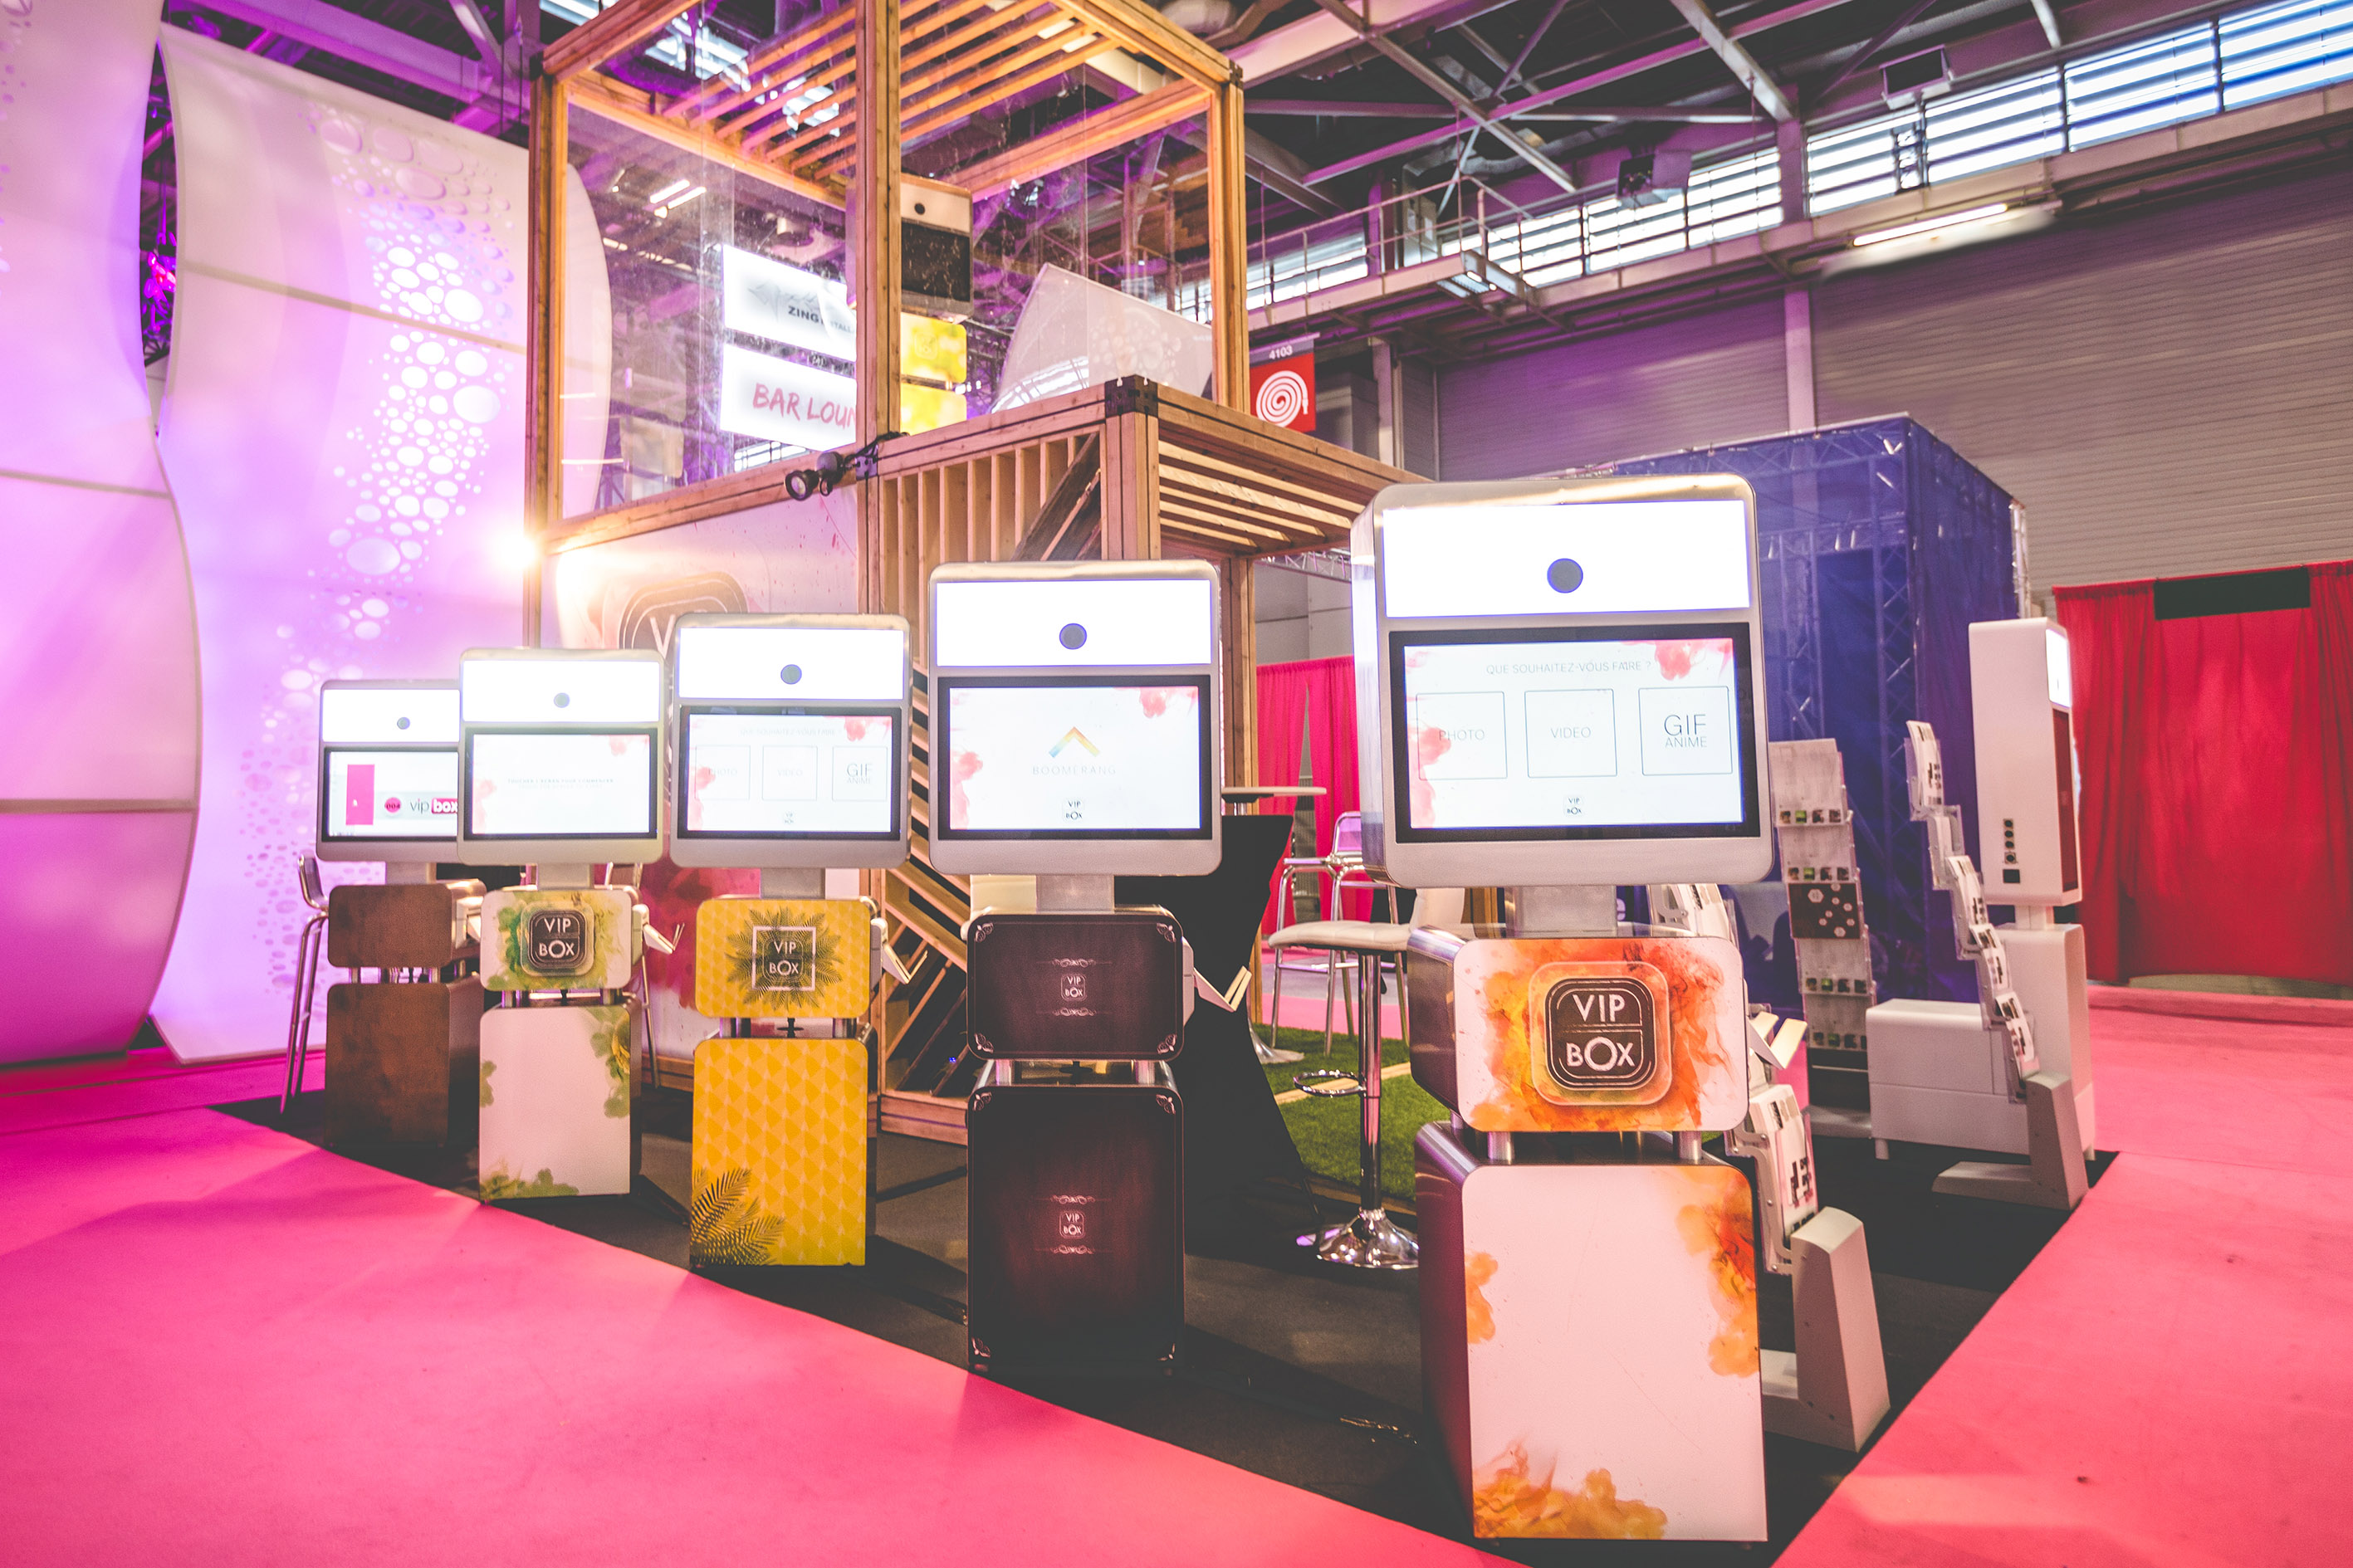 VIP box photobooth & animations photo - cabine photo - borne ... Vip Box Wiring Diagram on